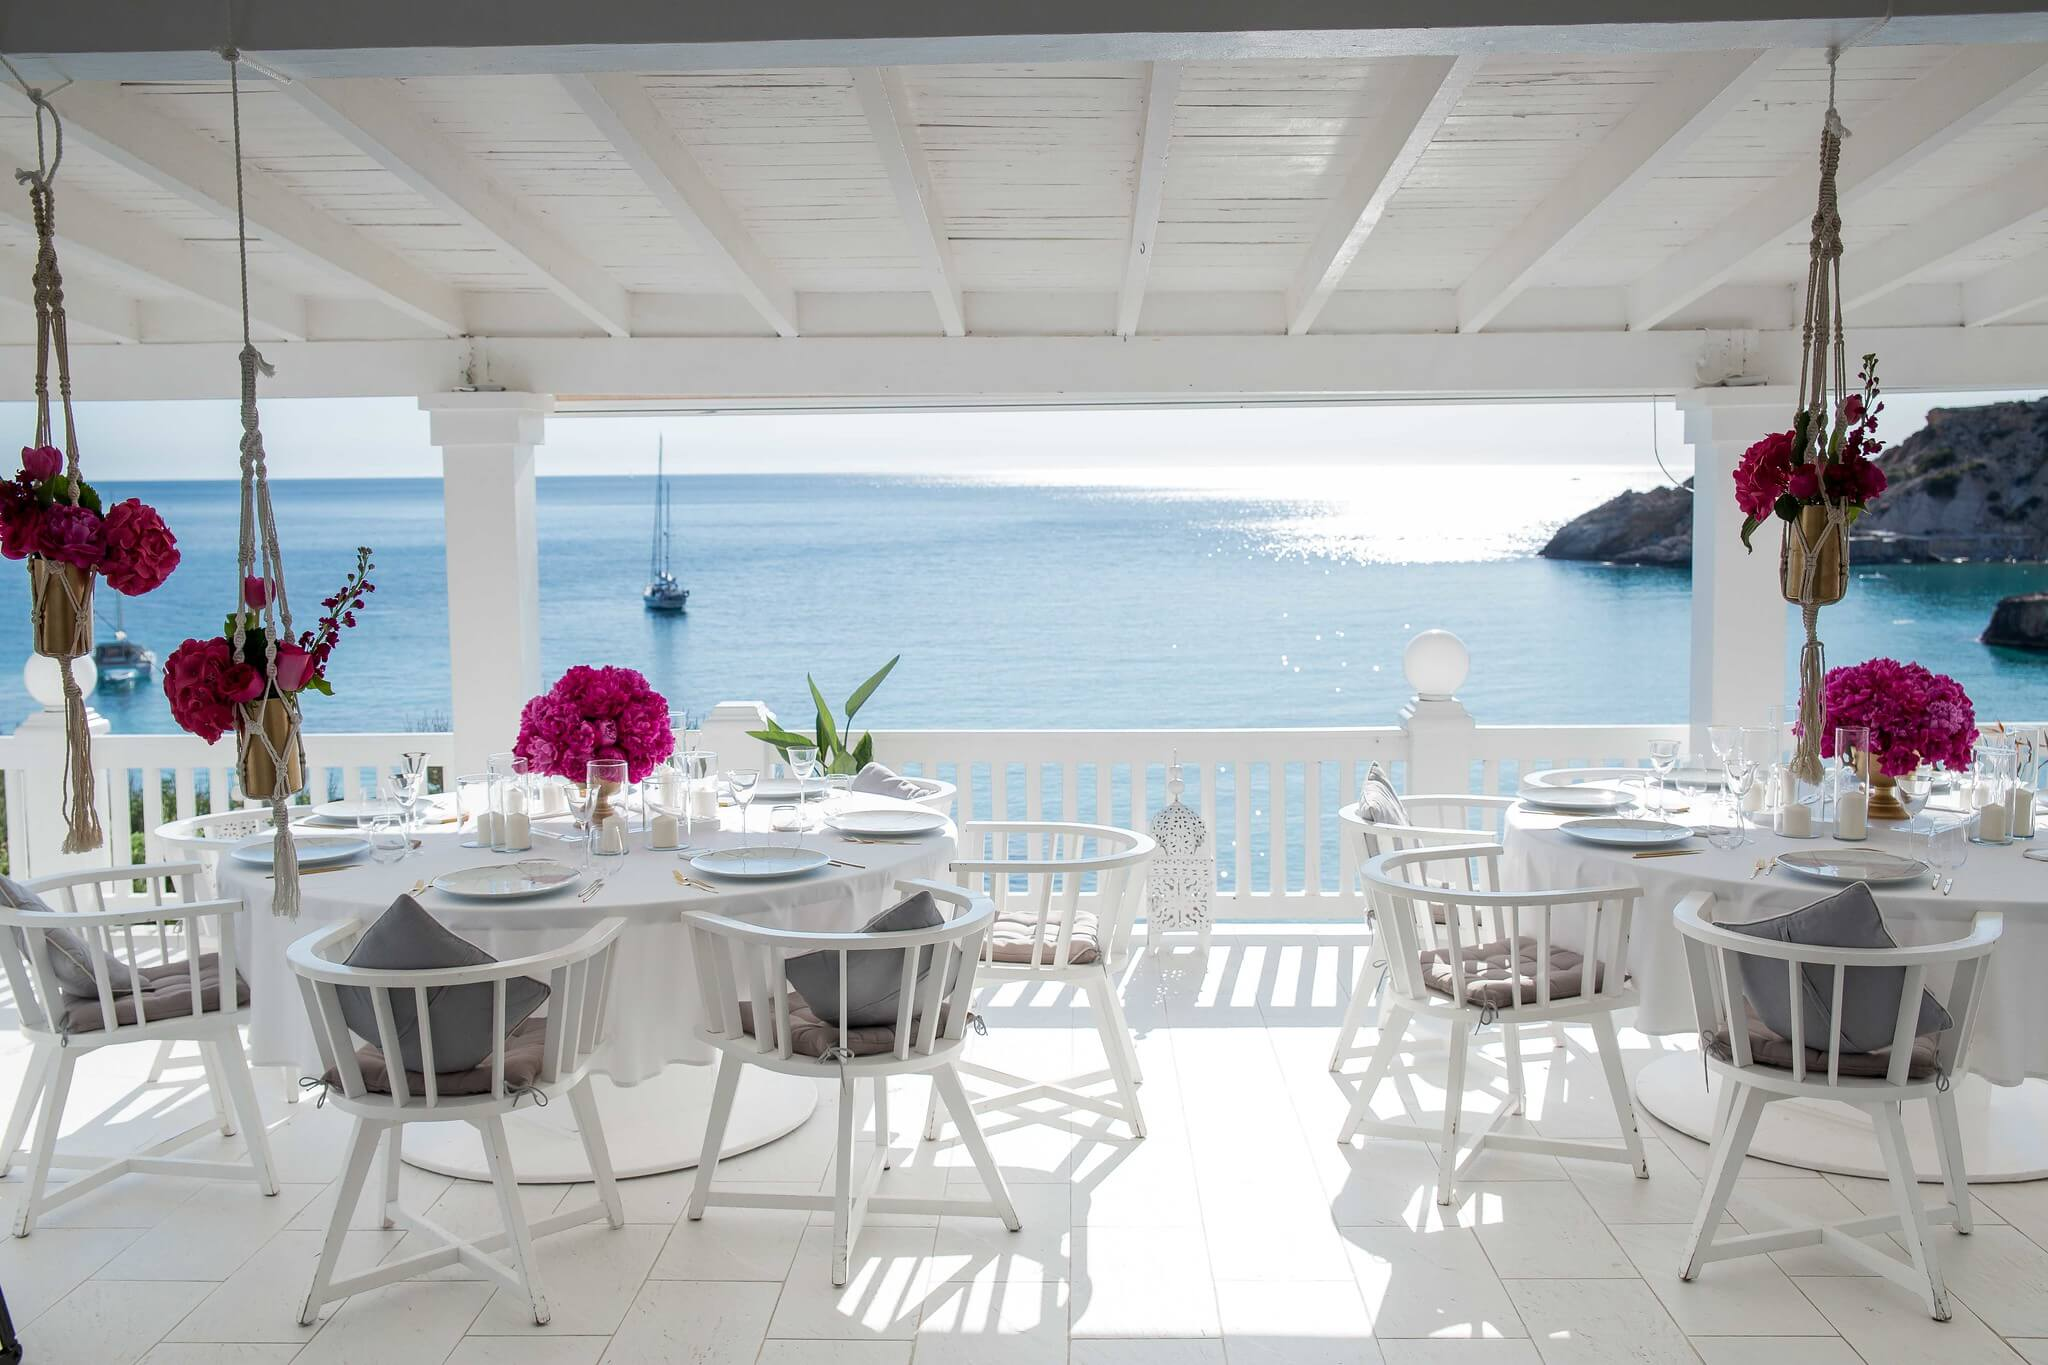 https://www.white-ibiza.com/wp-content/uploads/2020/03/ibiza-wedding-venues-cotton-beach-2020-04.jpg